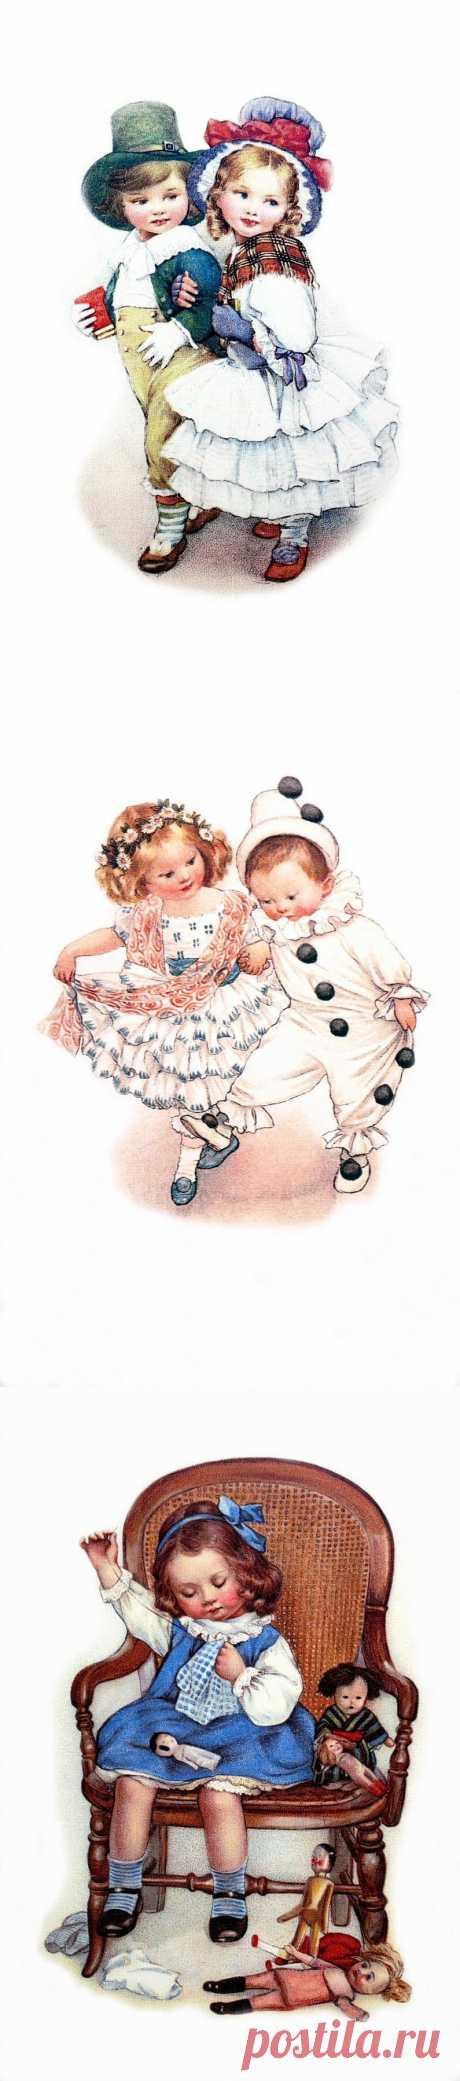 Ретро открытки с детками.